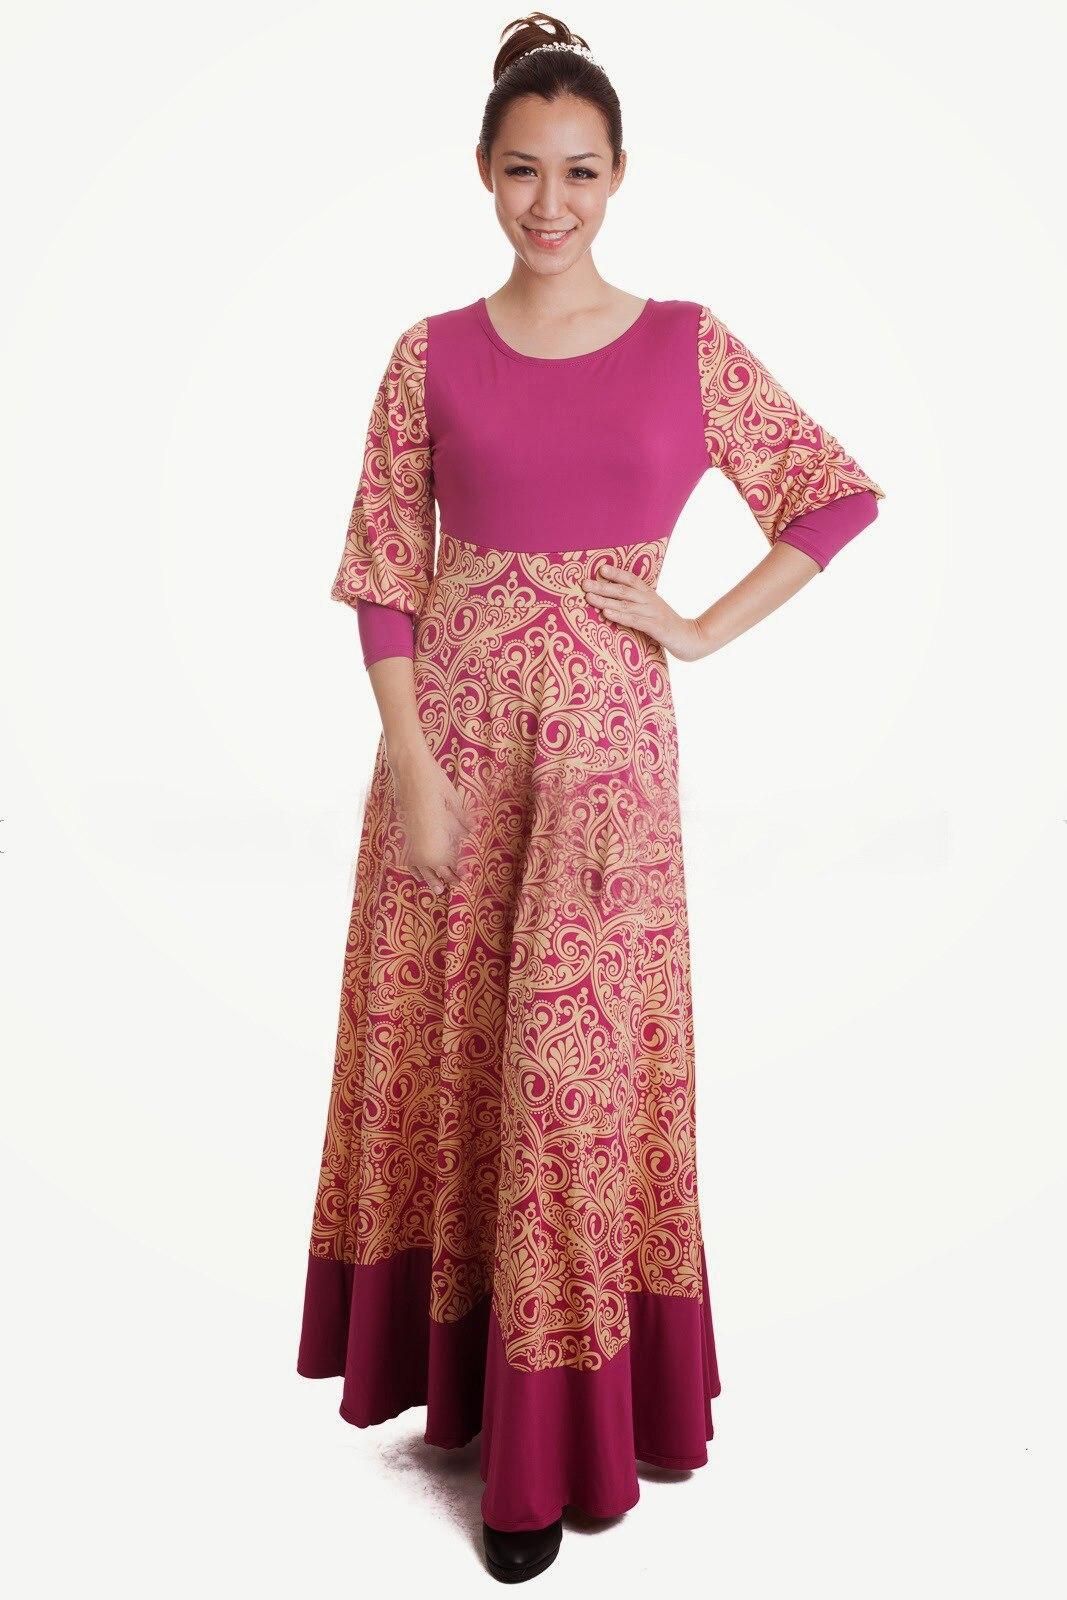 bd09f921da Milk Silk Cotton Dress Long Sleeve 2017 New Muslim Floral Print O ...